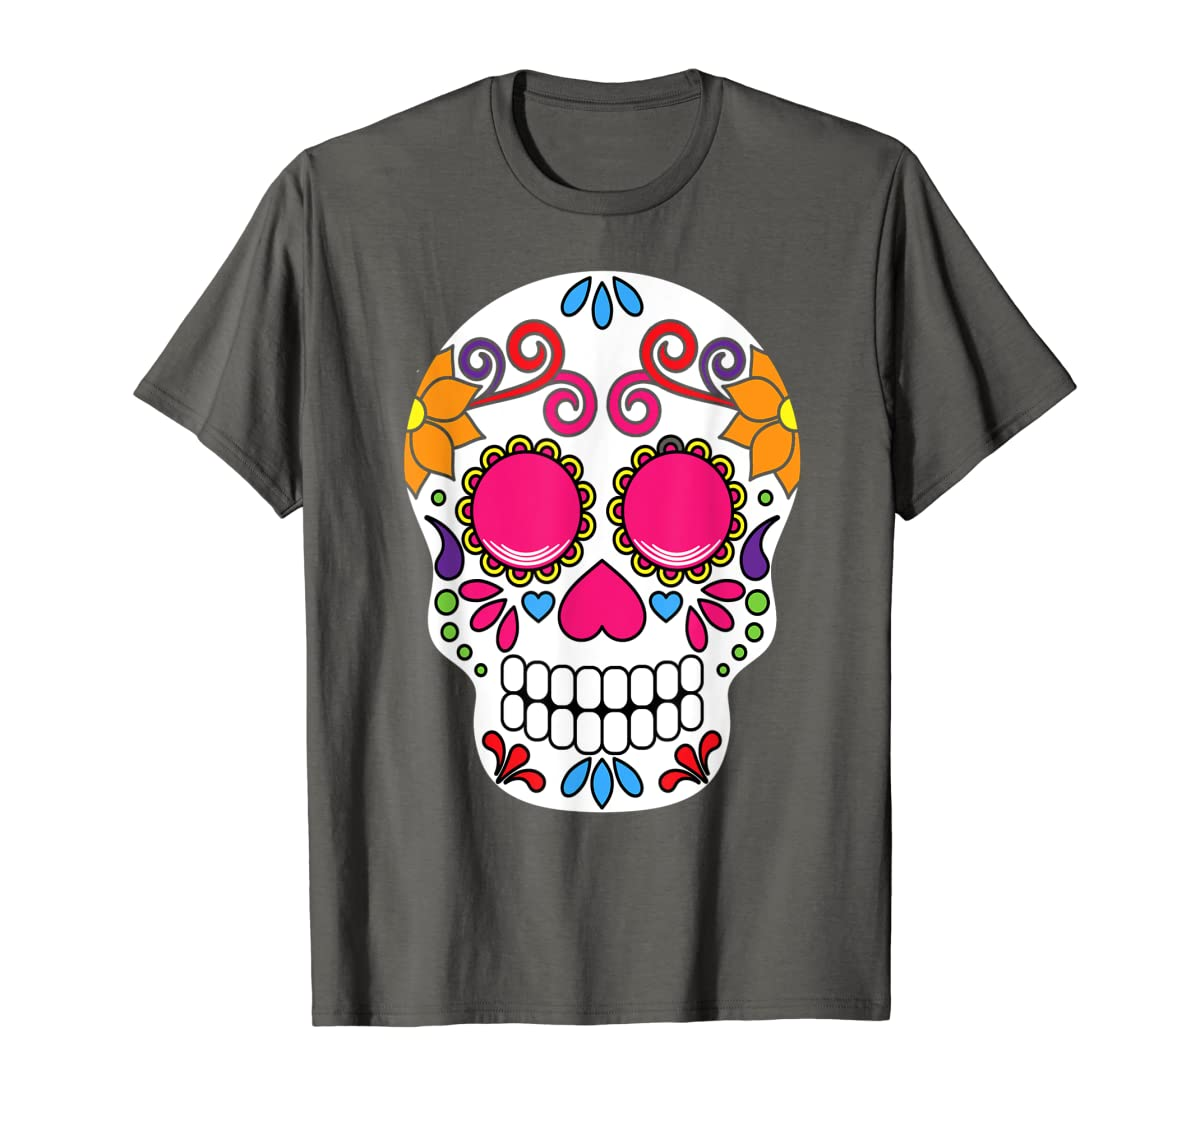 Colorful Day Of The Dead Sugar Skull Halloween T-shirt-Men's T-Shirt-Dark Heather